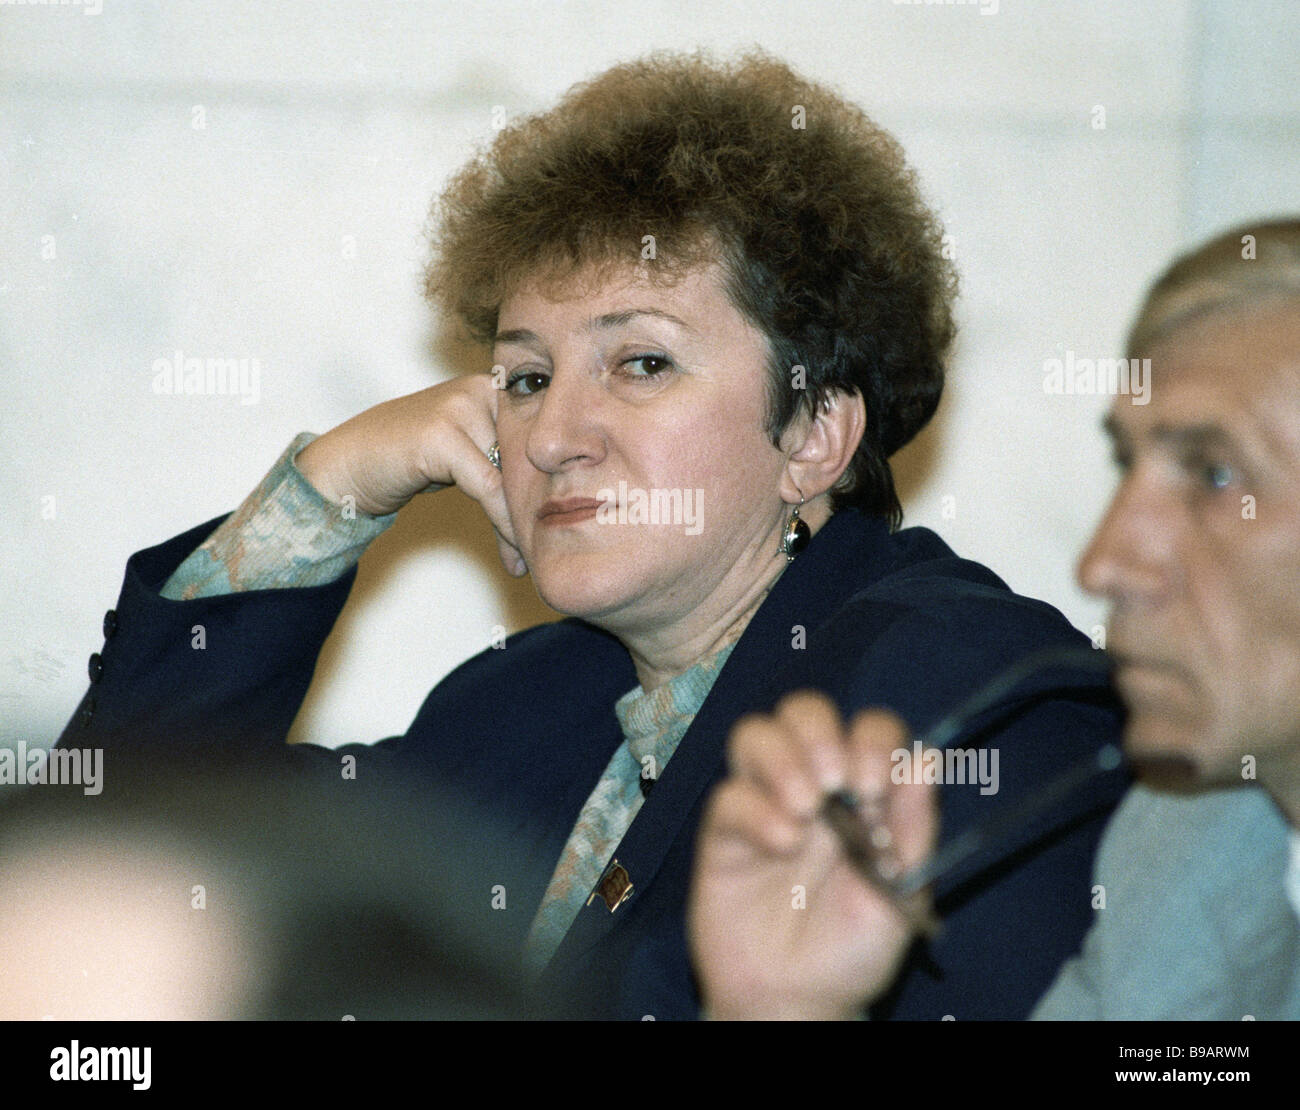 Russian MP Galina Starovoytova left - Stock Image